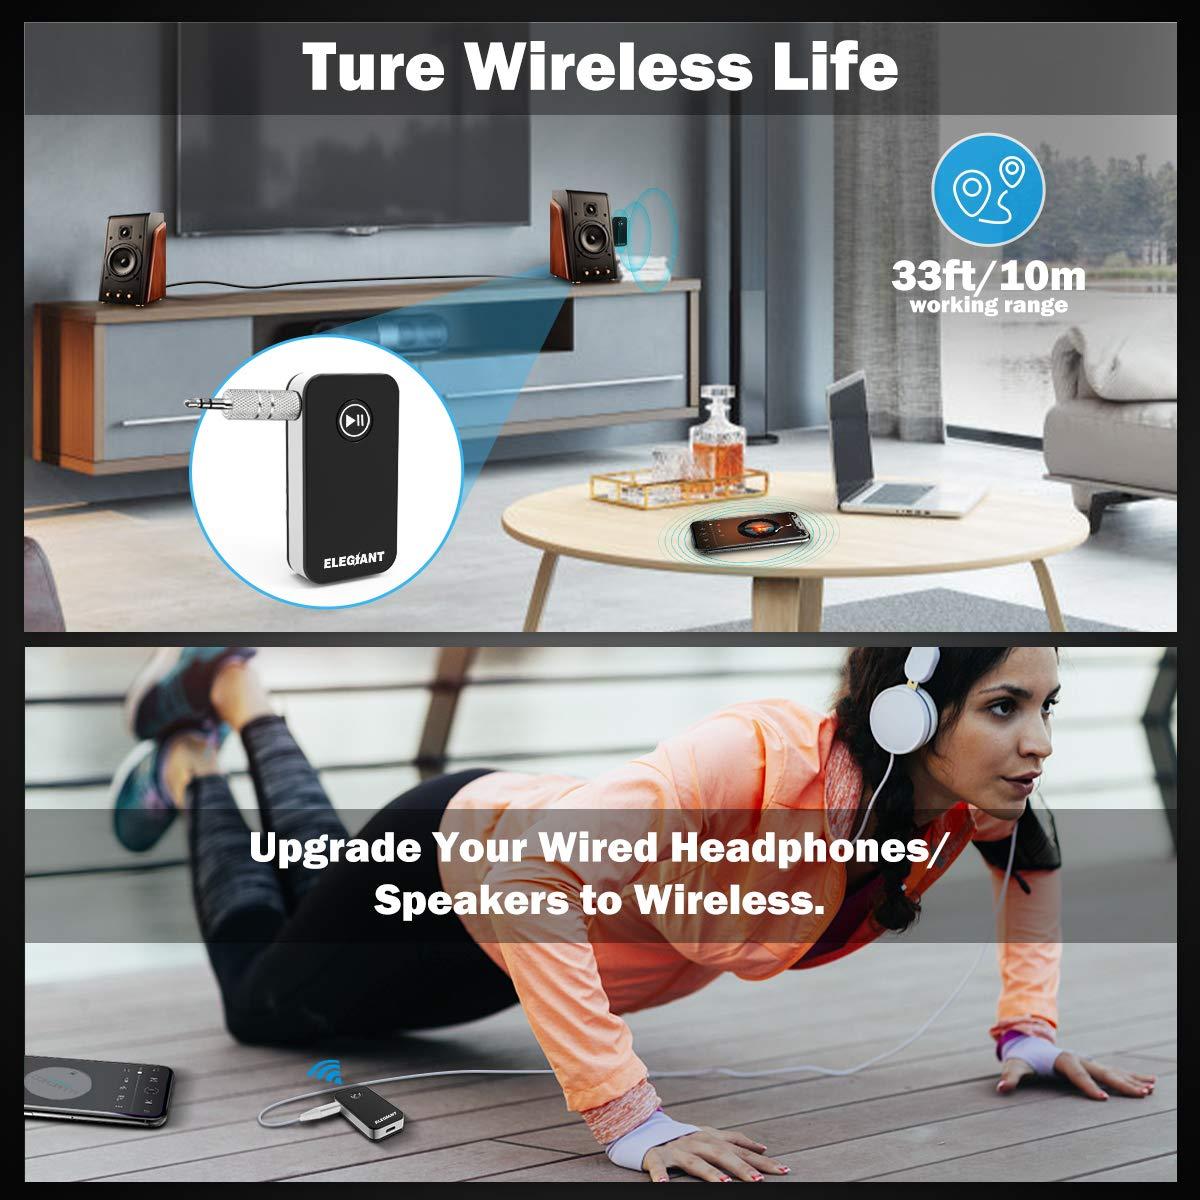 Adattatore Audio Wireless per Cuffie Altoparlanti Stereo TV PC Tablet Laptop Car iPhone XS Max XR x 8s iPad Samsung s10 s9 s8 Huawei P20 HTC ECC ELEGIANT Ricevitore Bluetooth